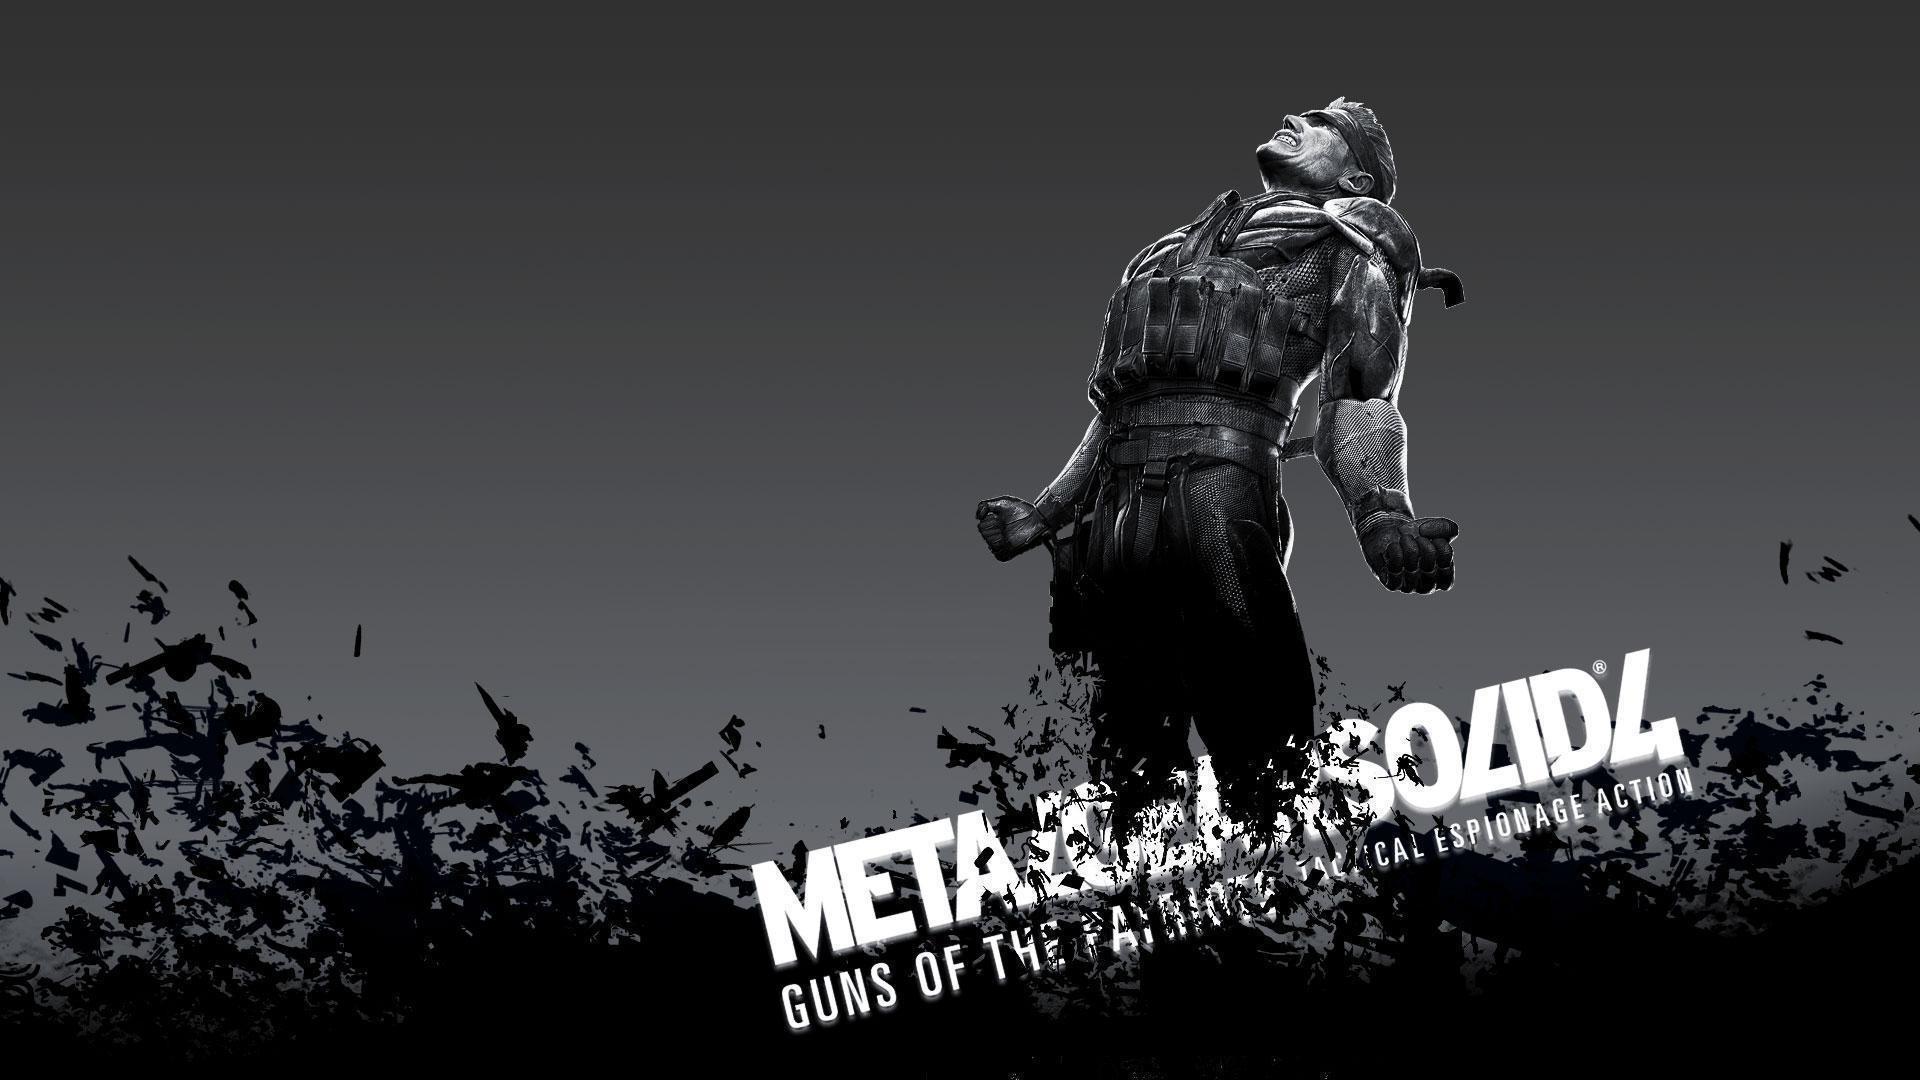 Metal Gear Solid 4 HD Wallpapers